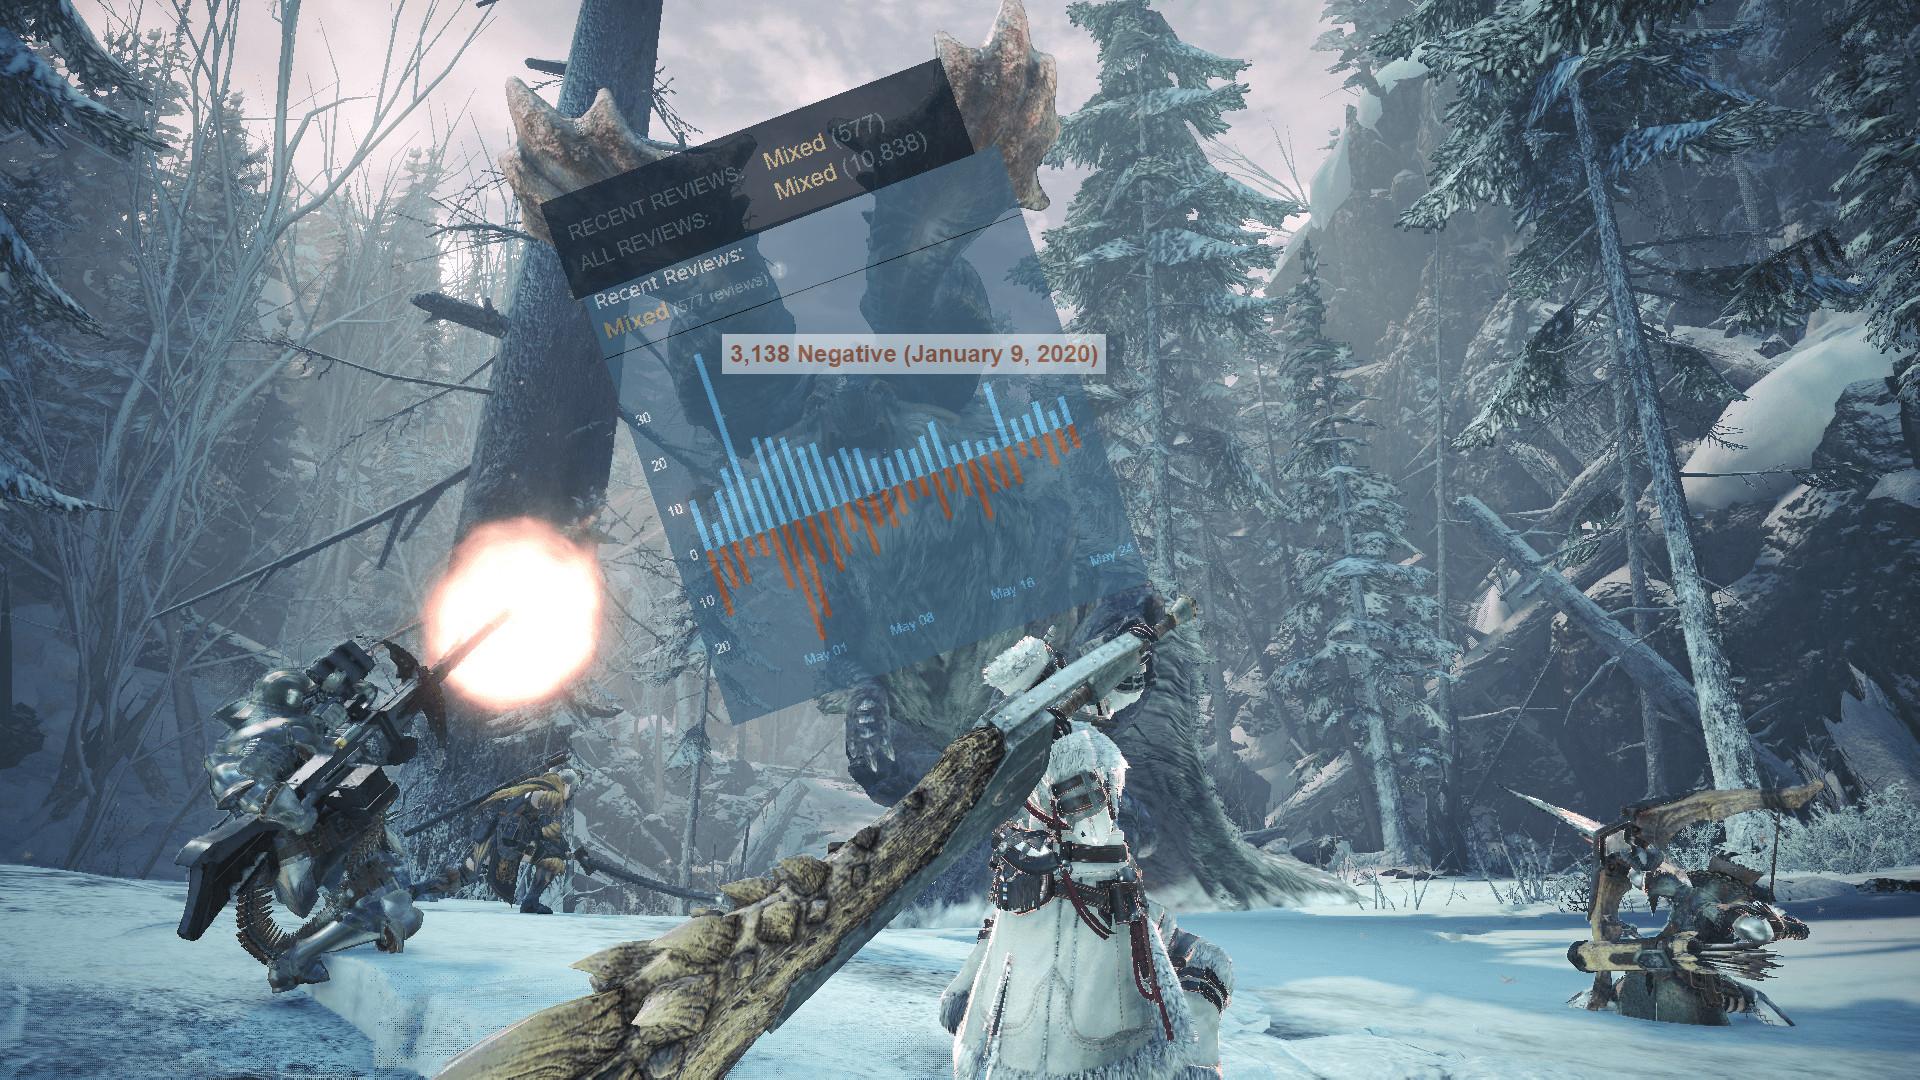 Monster Hunter: World Iceborne's rocky PC launch still haunts its Steam reviews